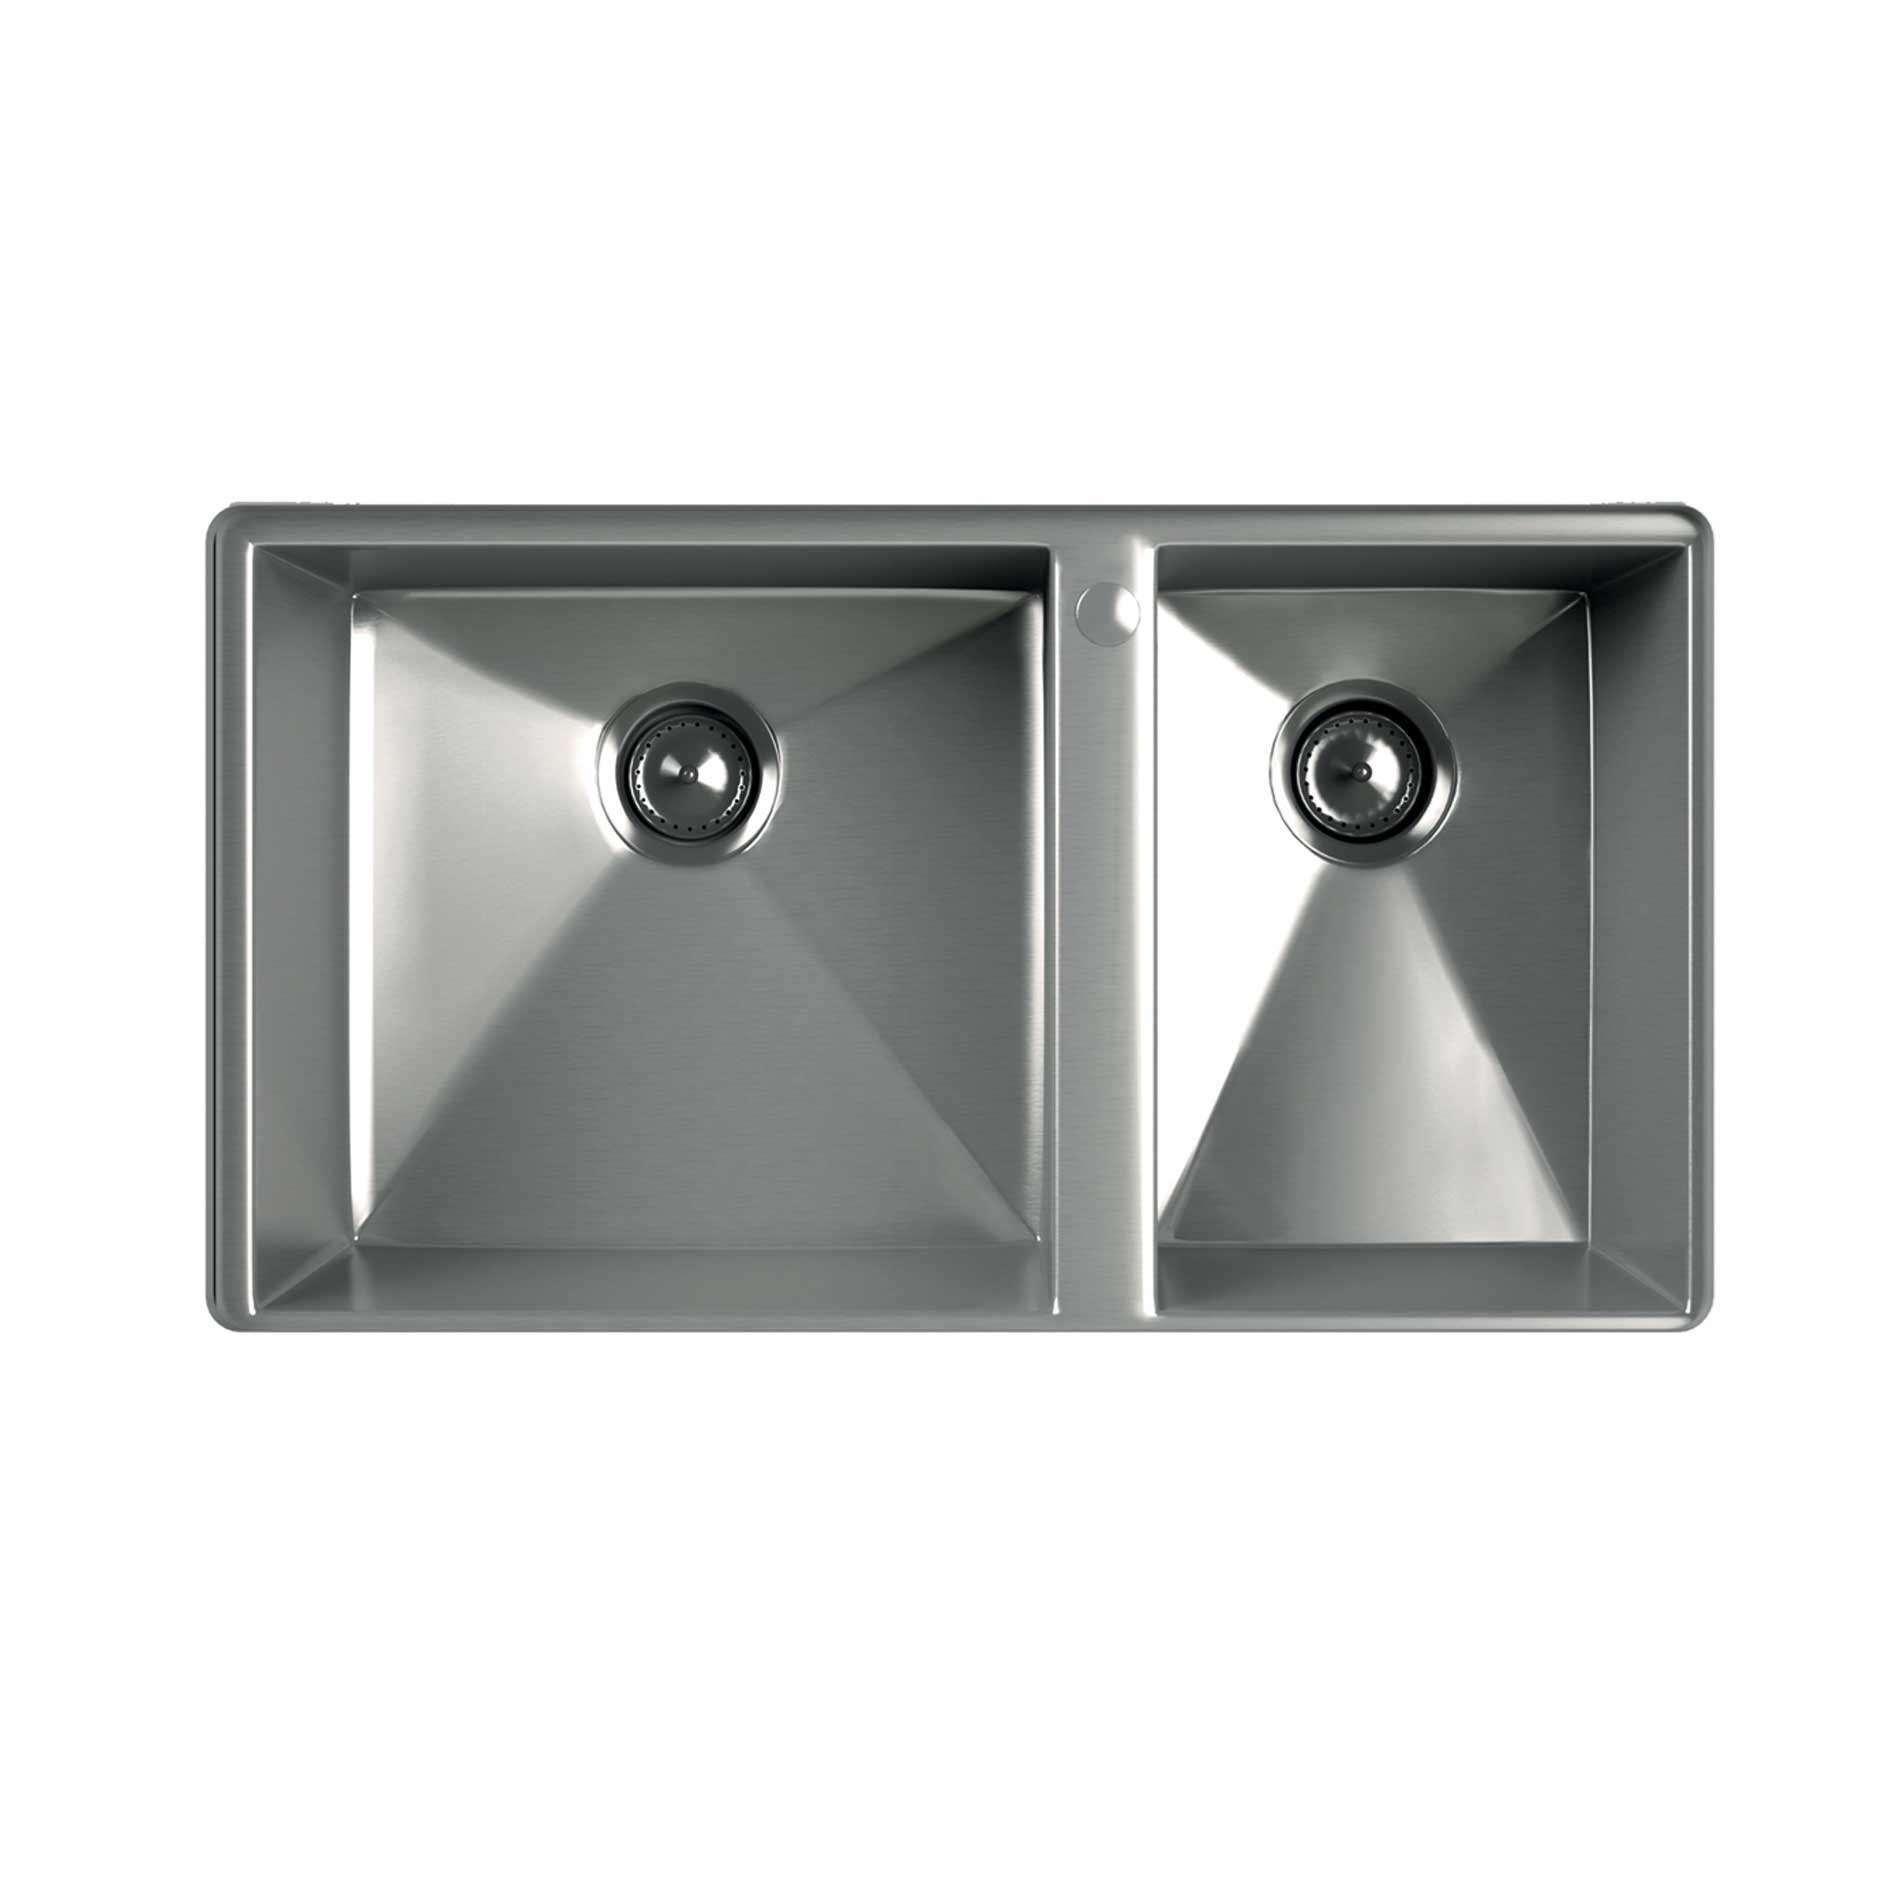 Stainless Steel Sink Manufacturers : Kohler: Geog 1-5 Bowl Stainless Steel Sink - Kitchen Sinks & Taps